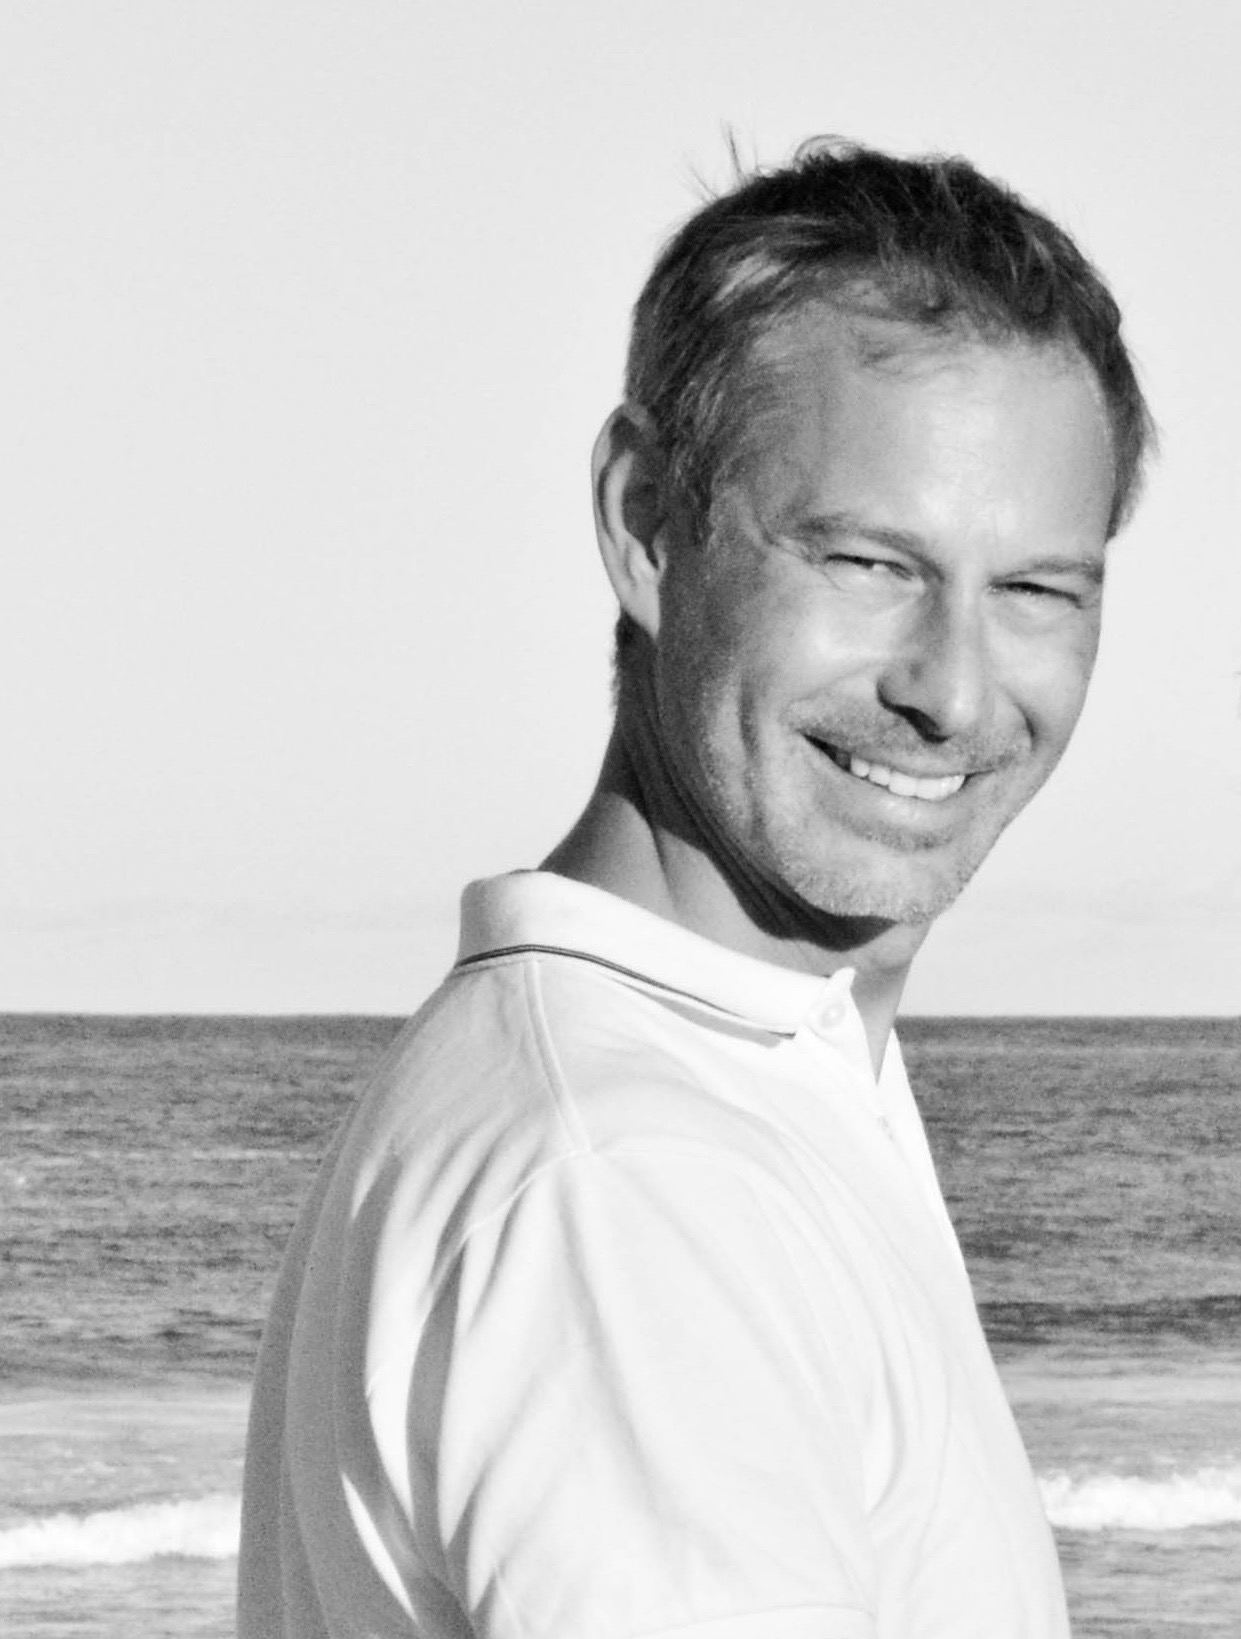 Florian Hanke